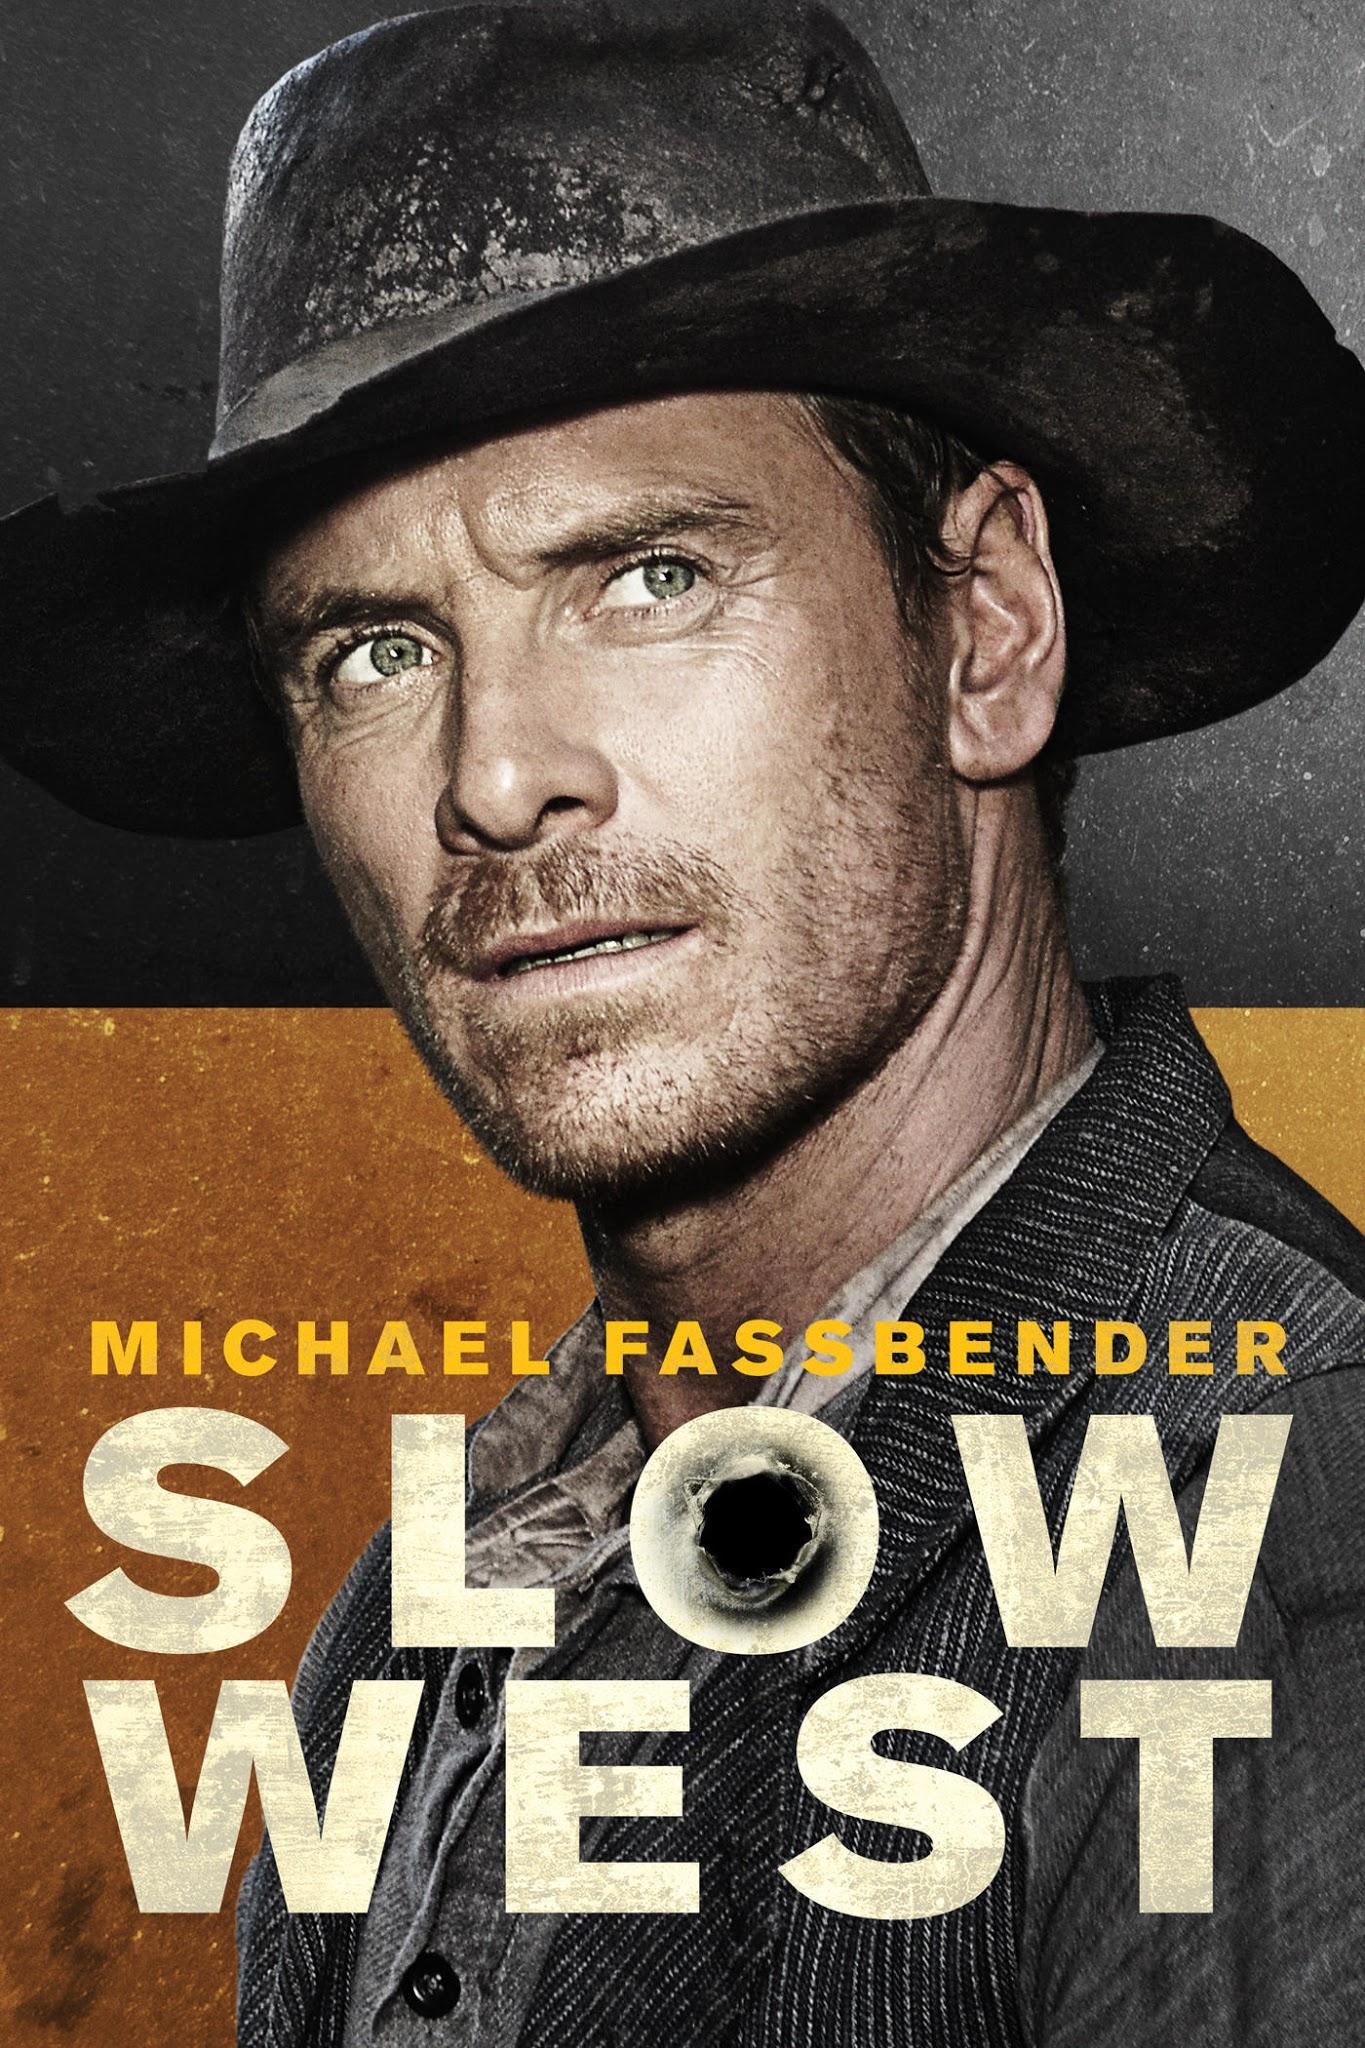 slow west film recenzja plakat michael fassbender